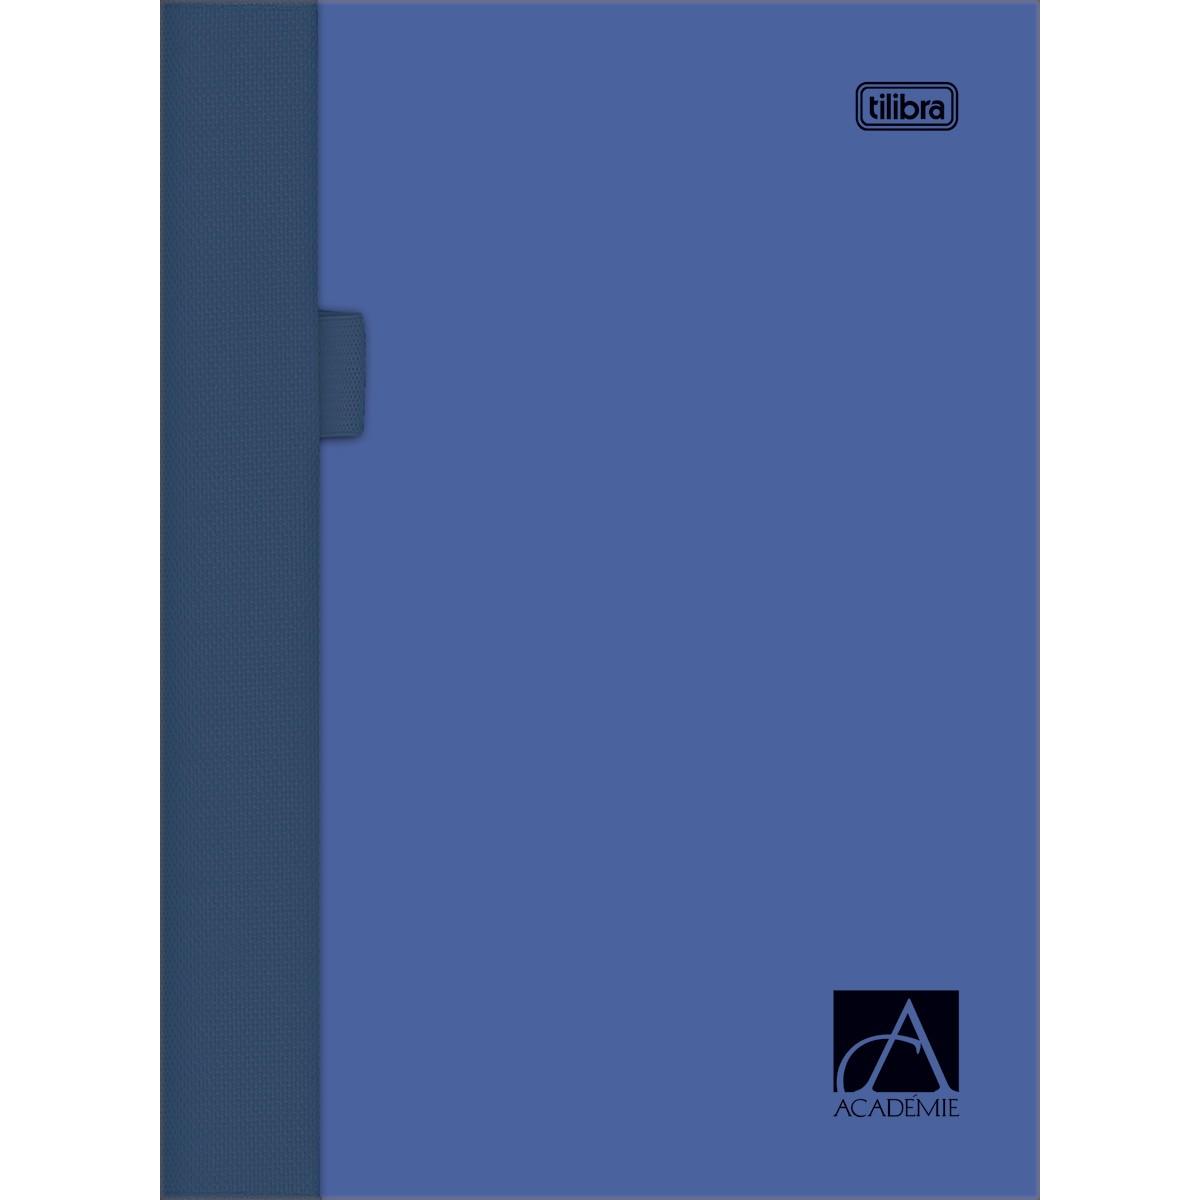 Caderno Sketchbook Espiral Capa Plástica Académie Sense 128g 70 Folhas 21,5 x 27,5 cm